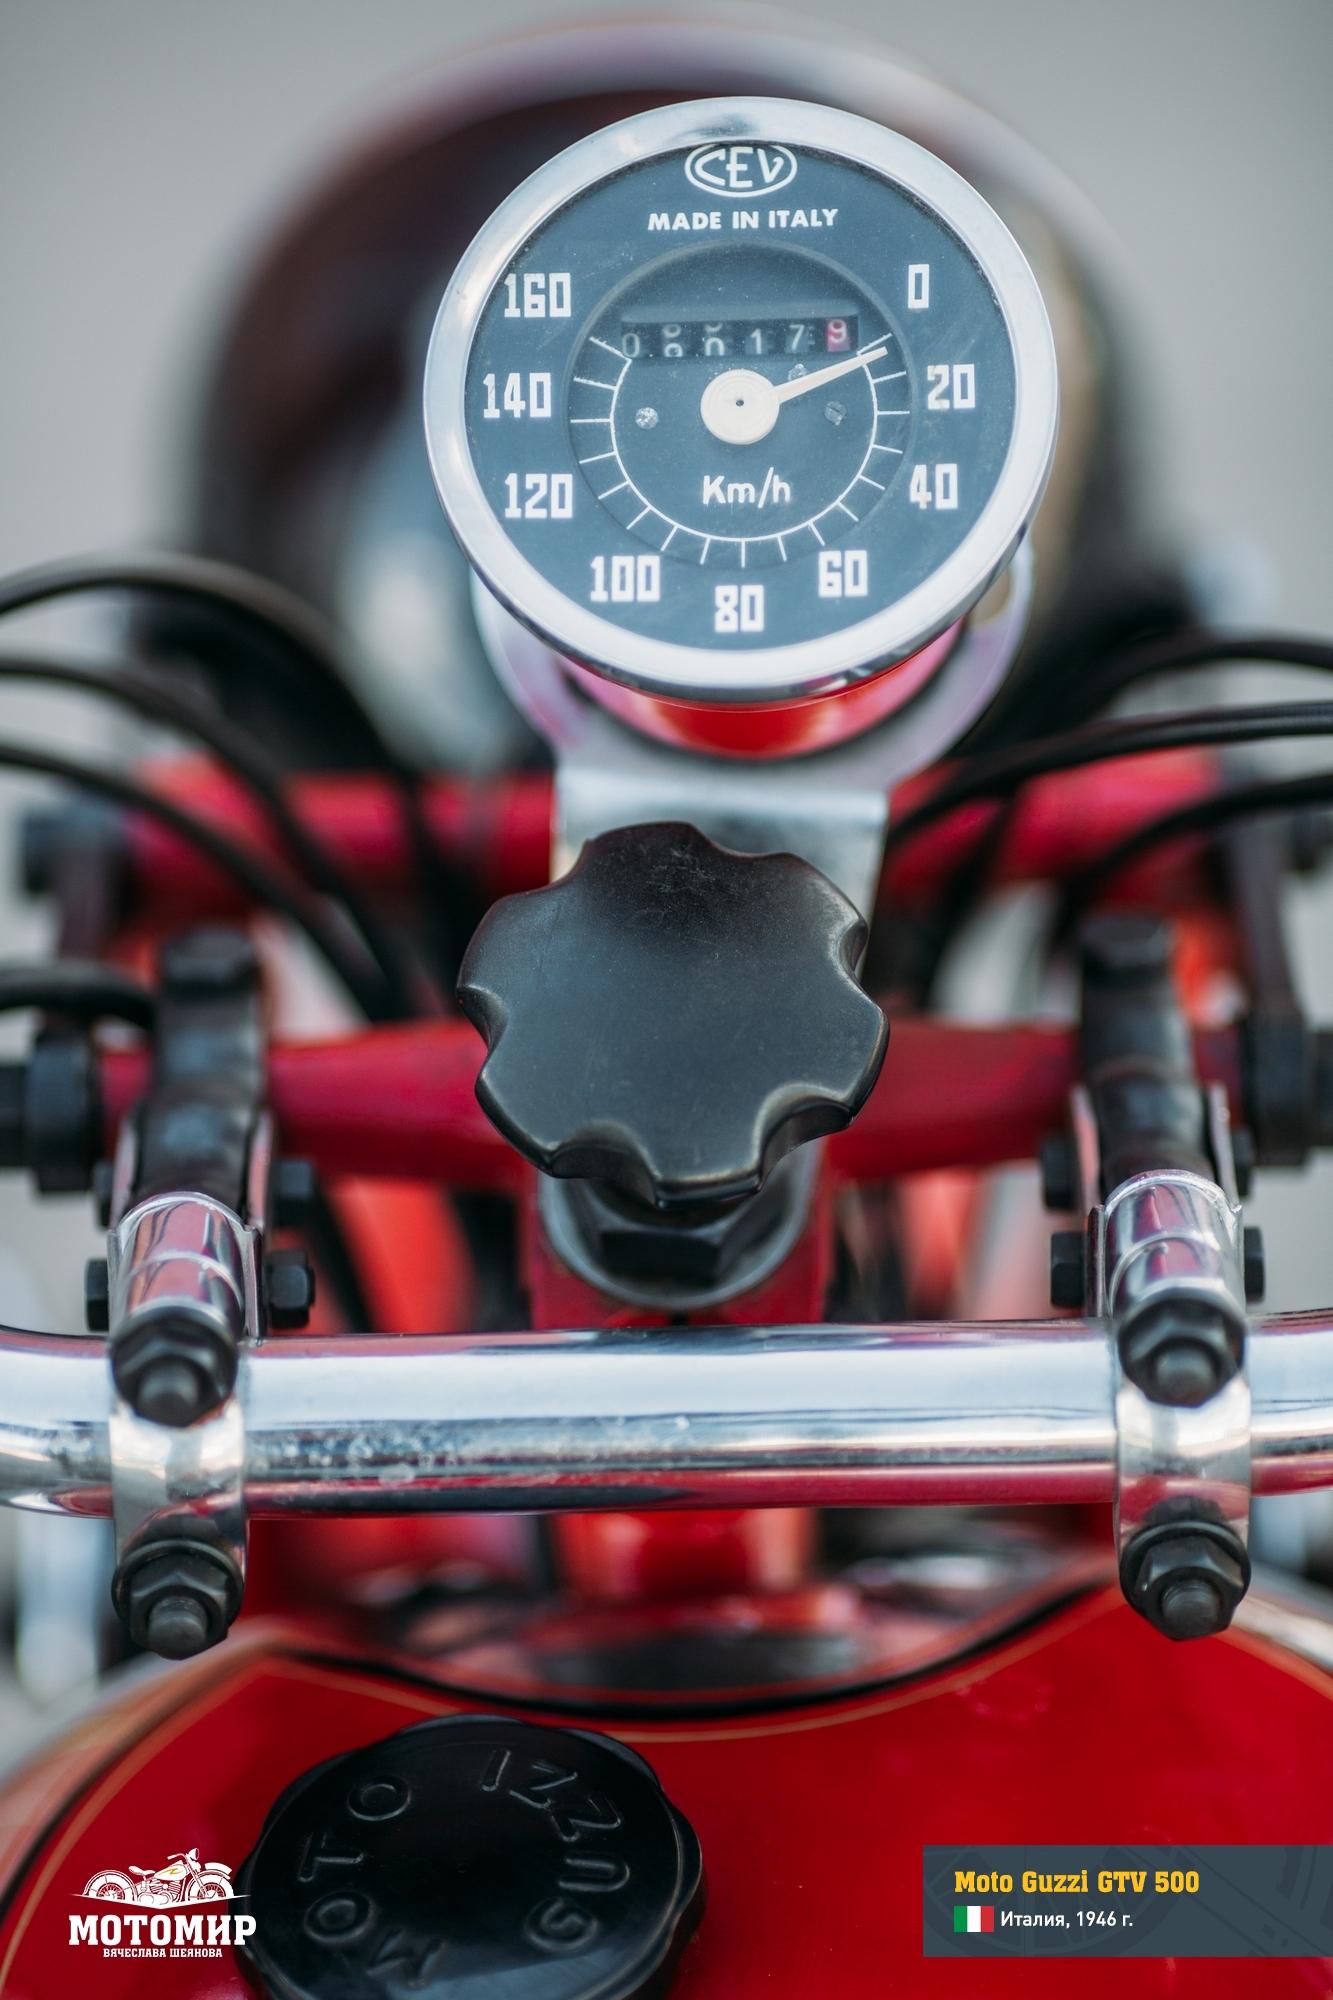 moto-guzzi-gtv-500-201509-web-19